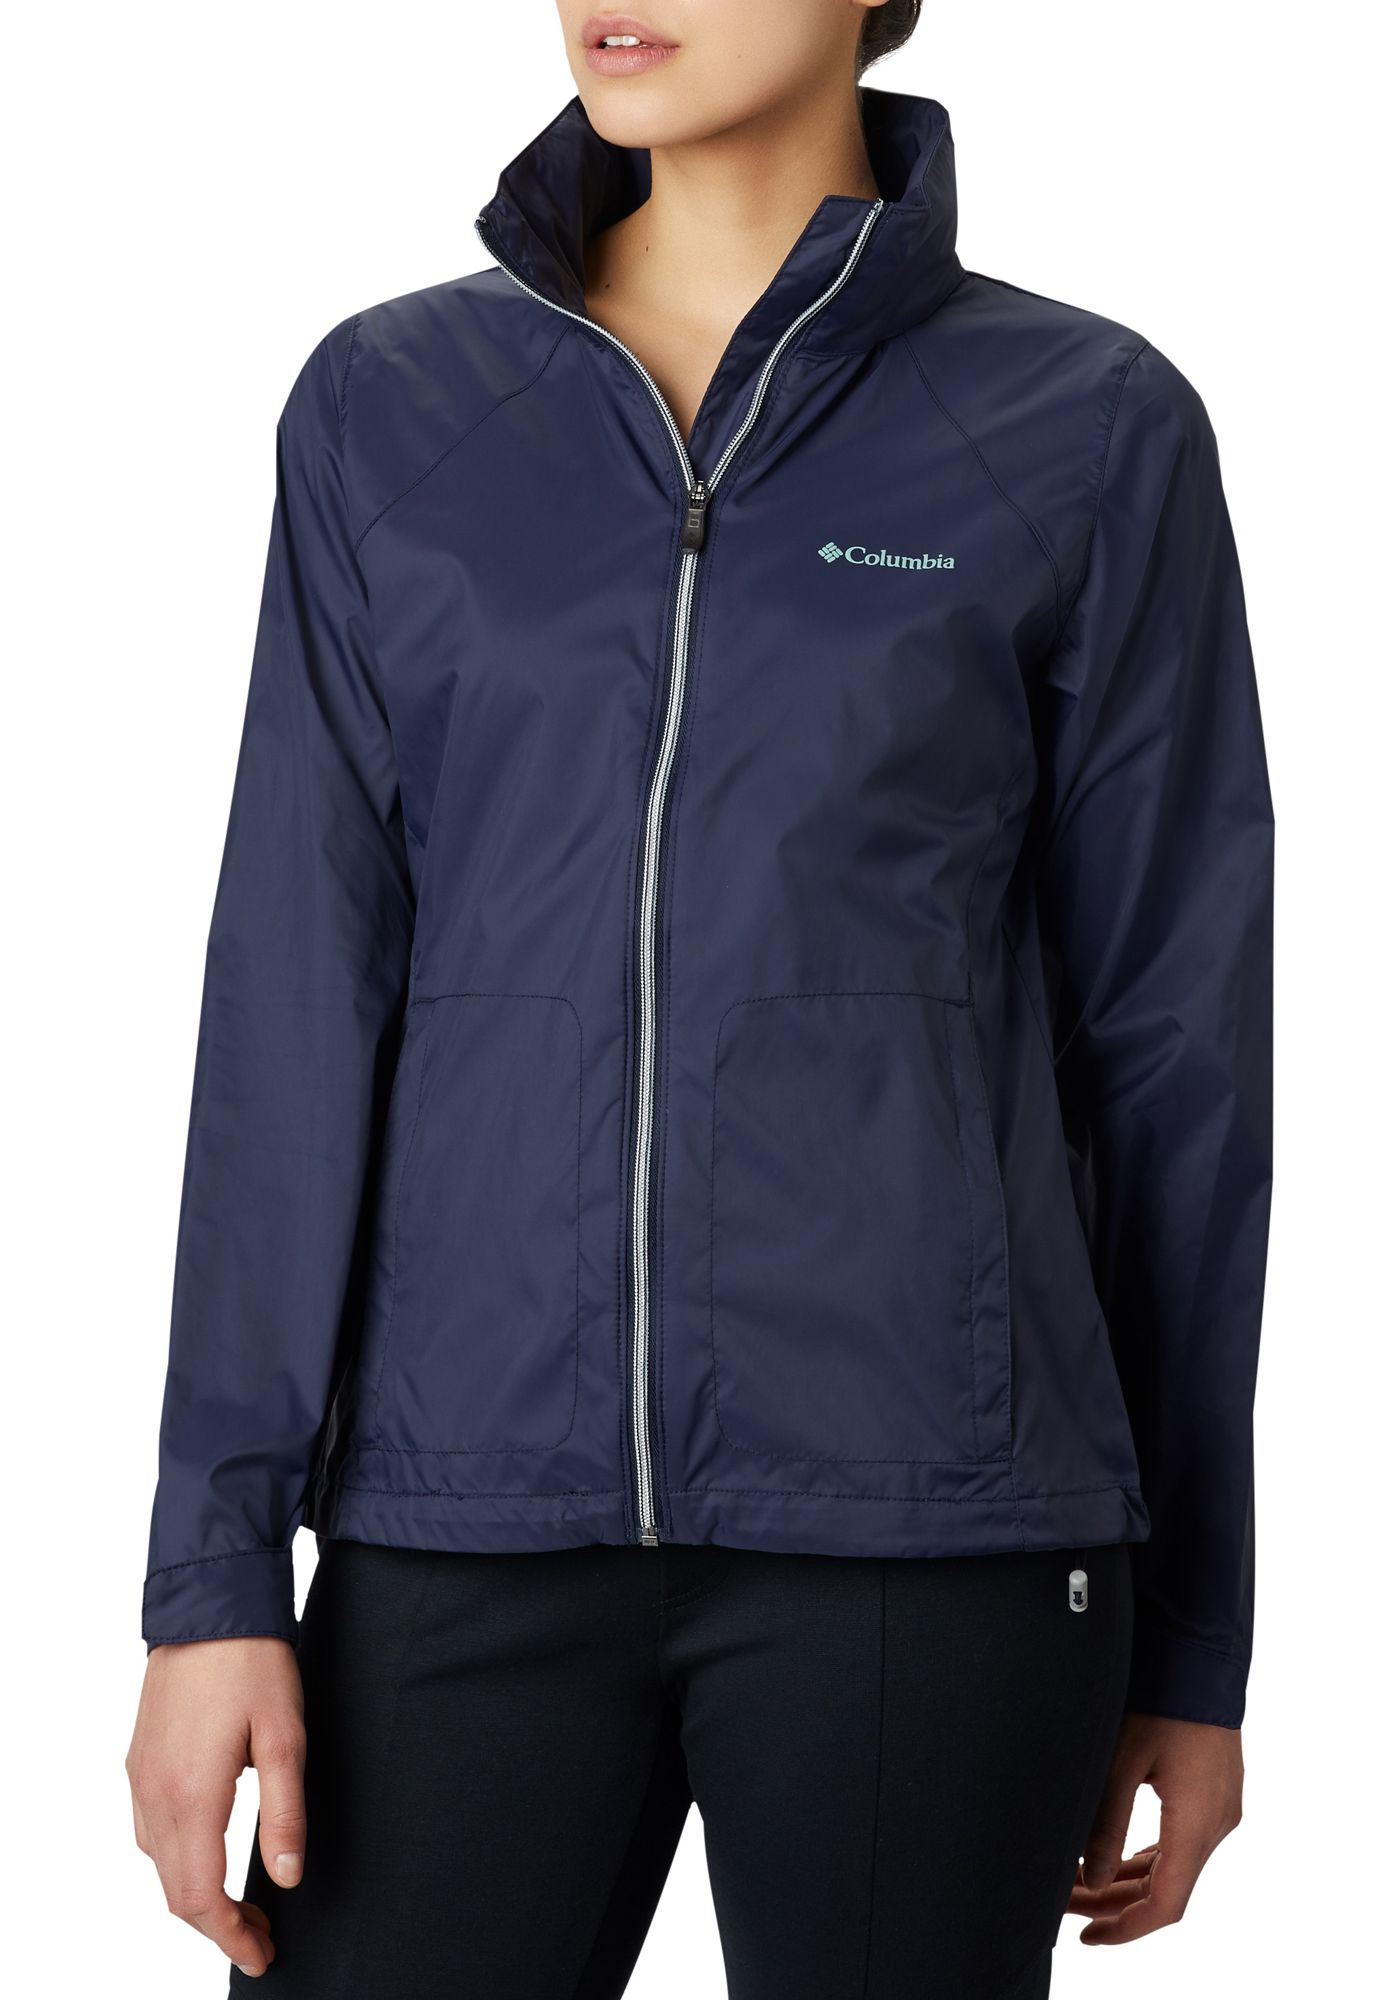 Columbia Women's Switchback Rain Jacket